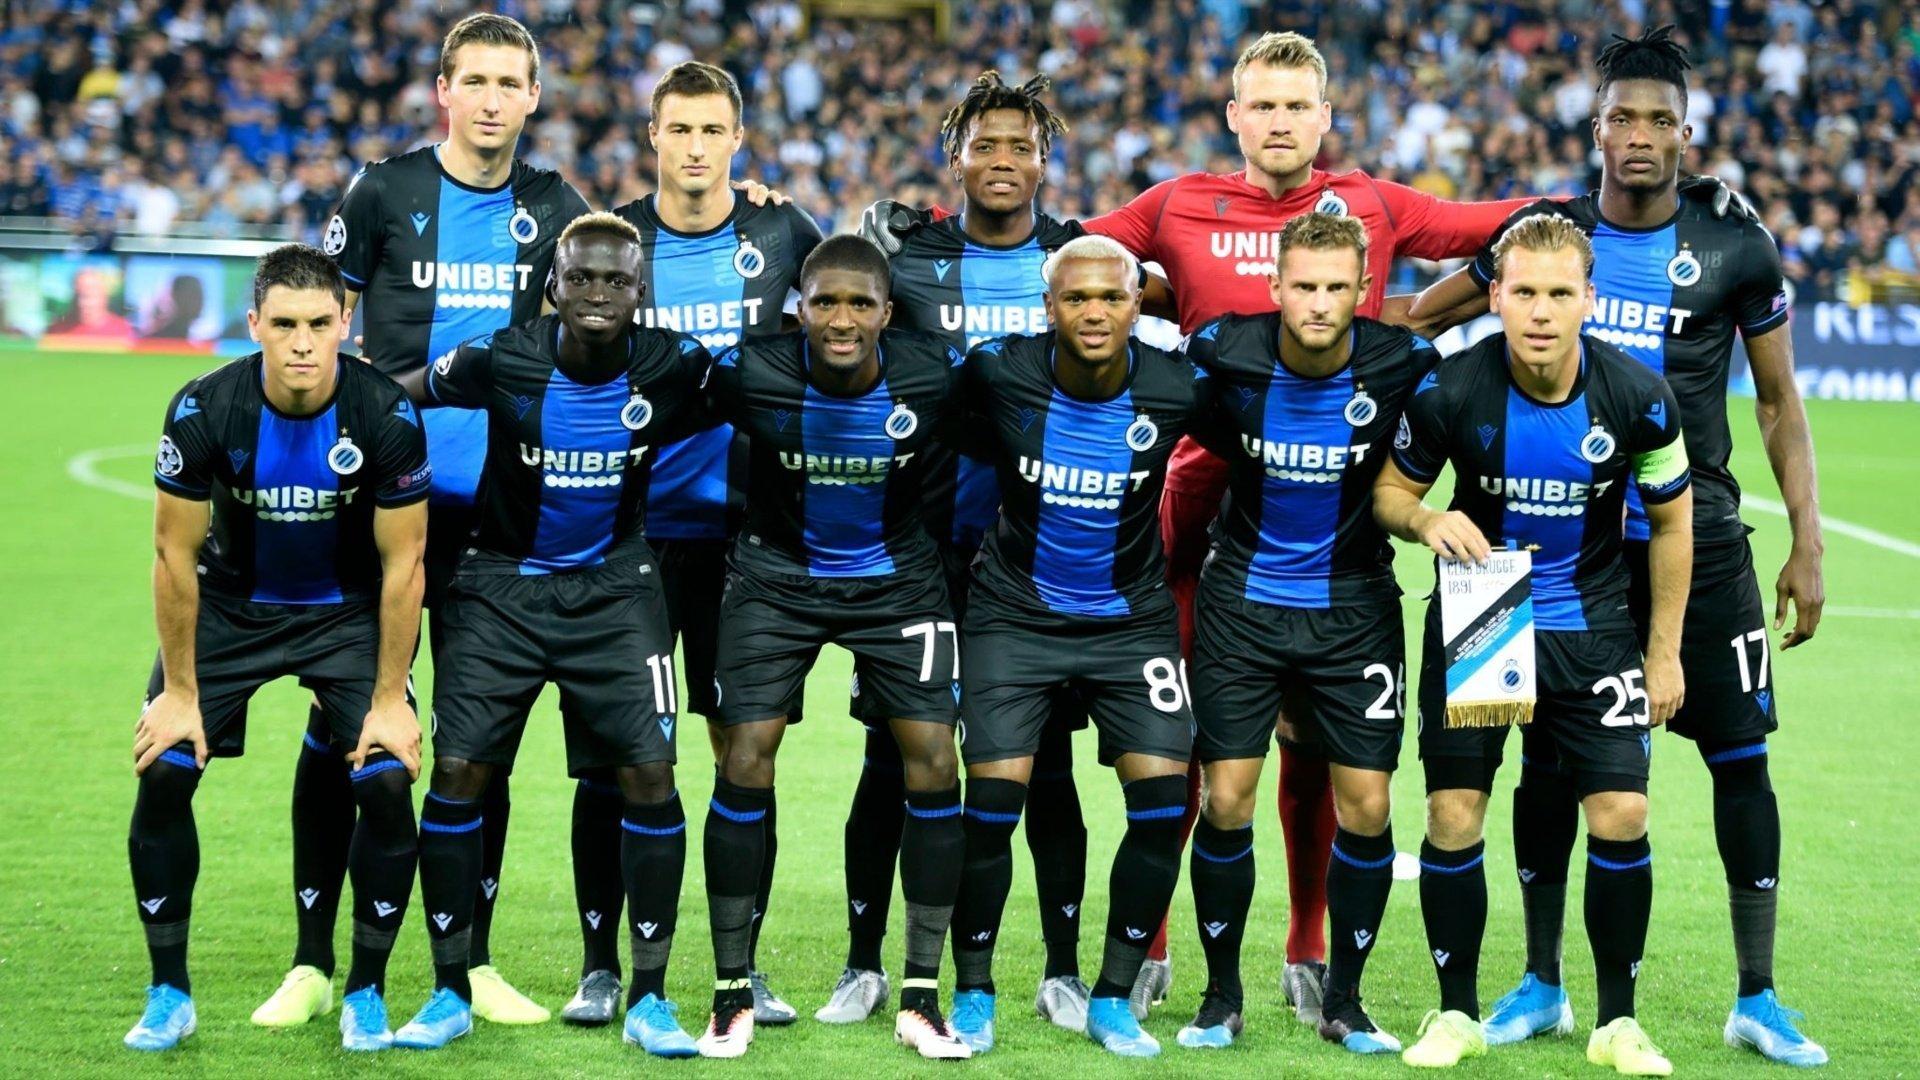 Champions League rivals: Club Brugge (Part 1/3)